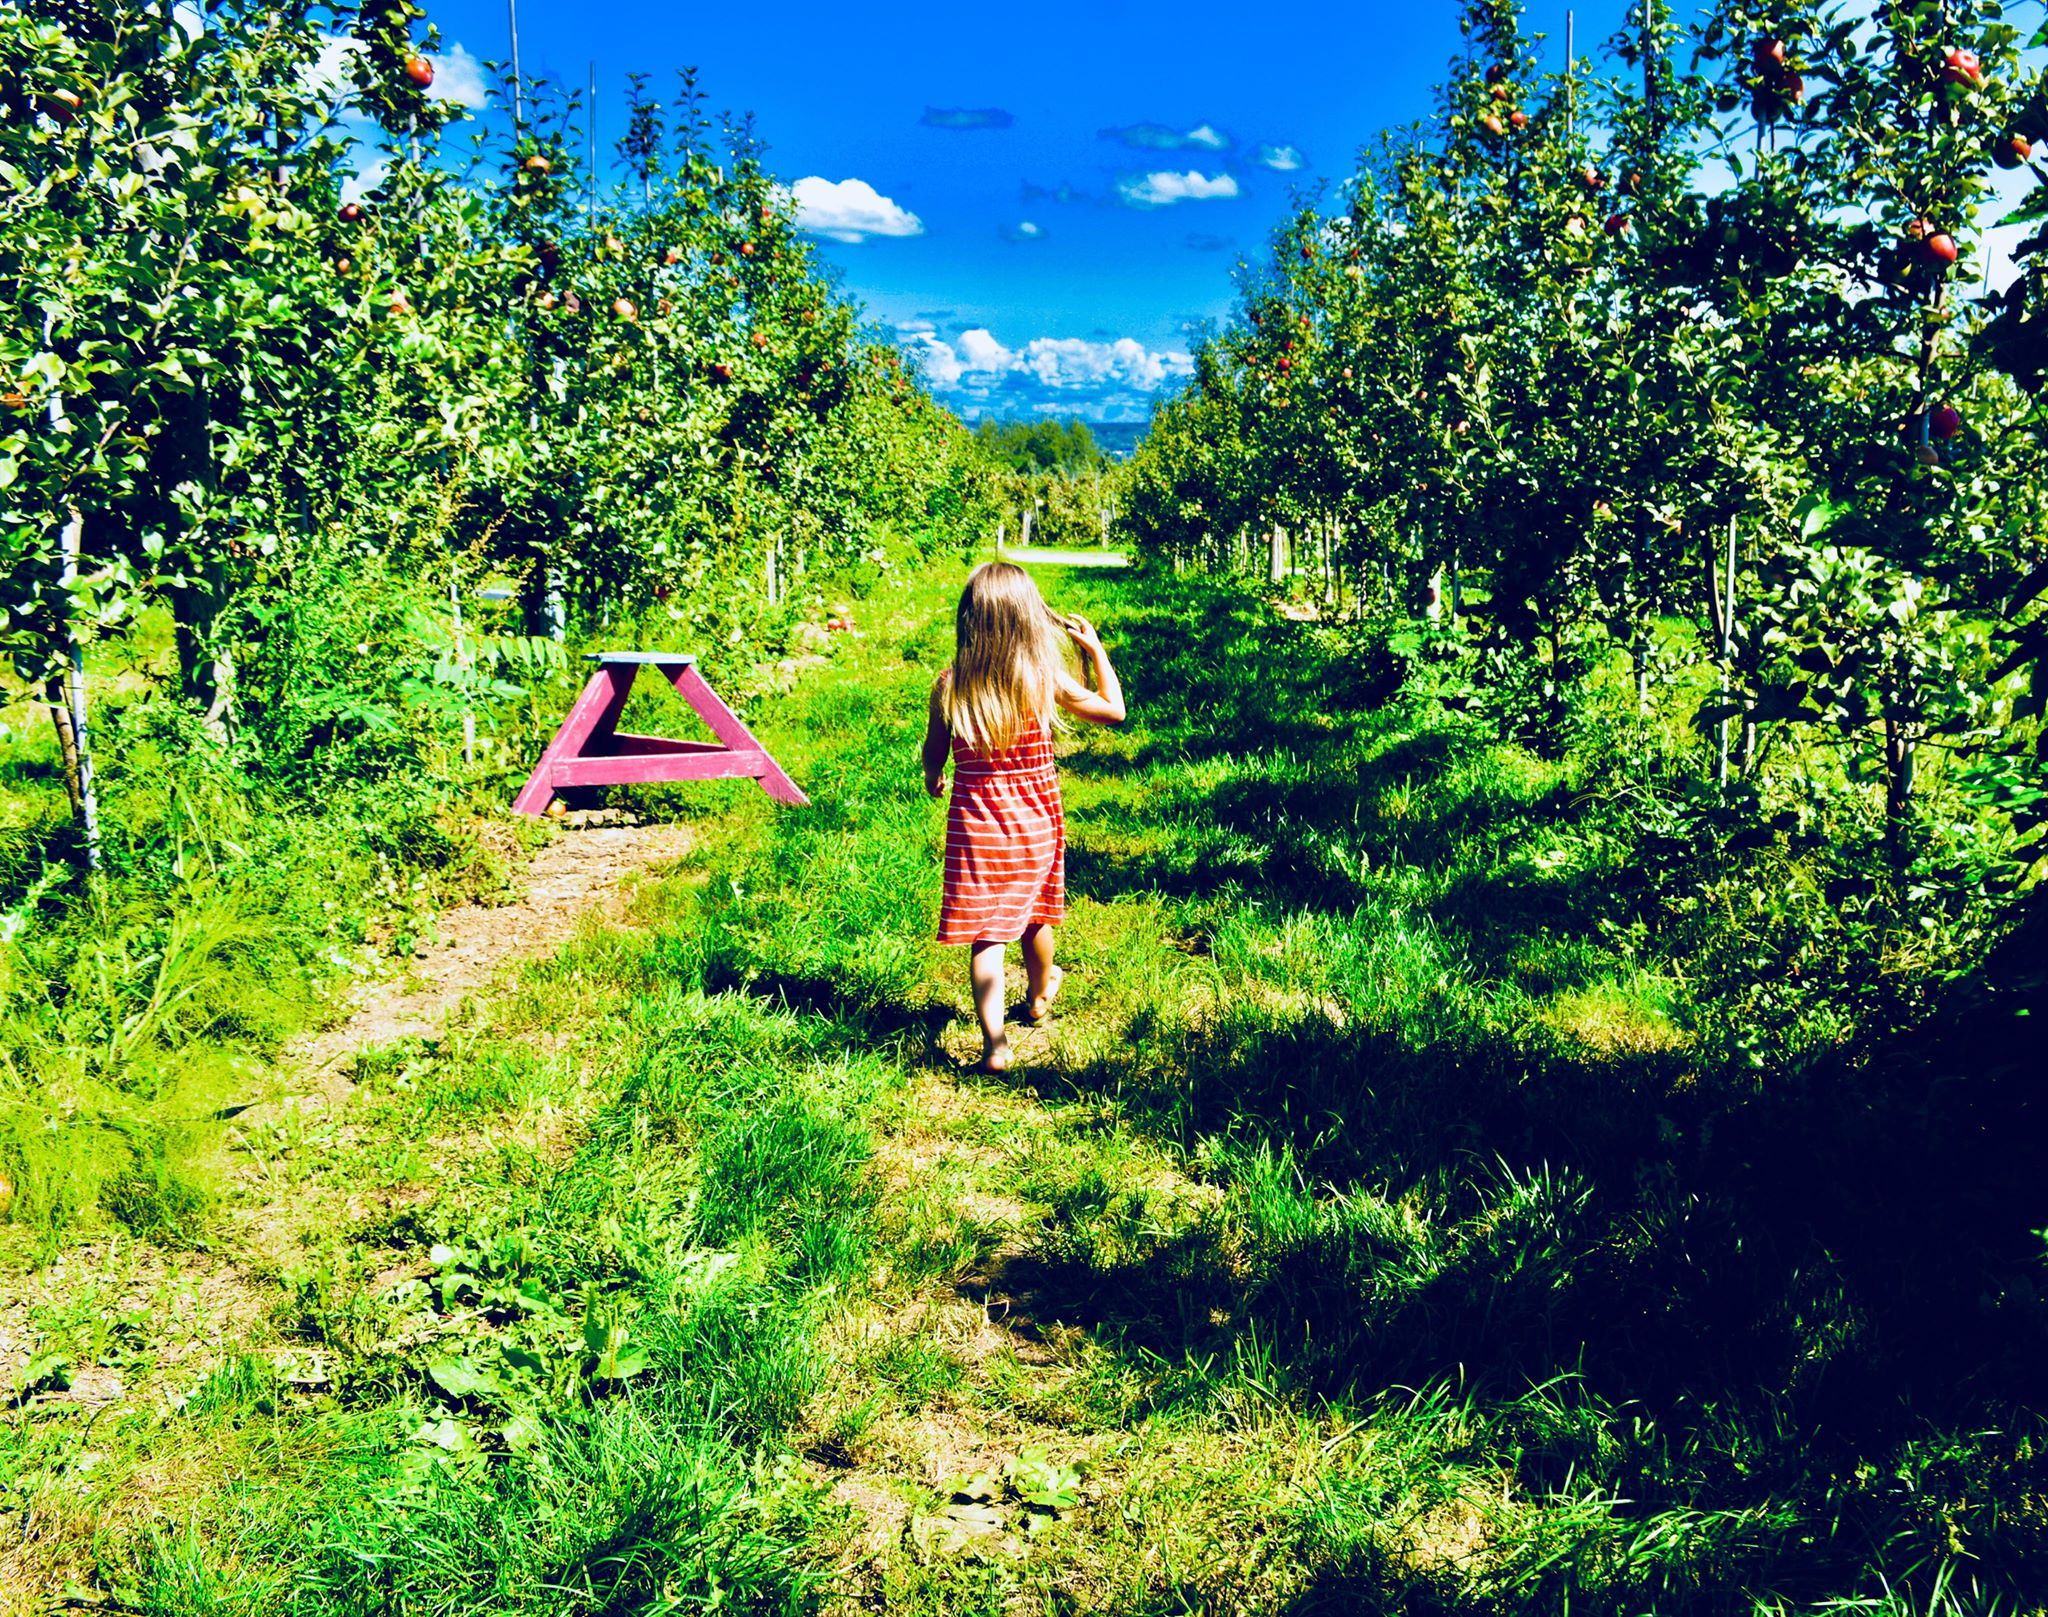 golden rod, summer, harvest, golden hour, seasonal eating, upstate new york, i love ny, summer harvest, modern homestead, autumn, seasonal living, plant based life, modern farmer, sunset, mabon, harvest moon, autumnal equinox, apple picking, orchards